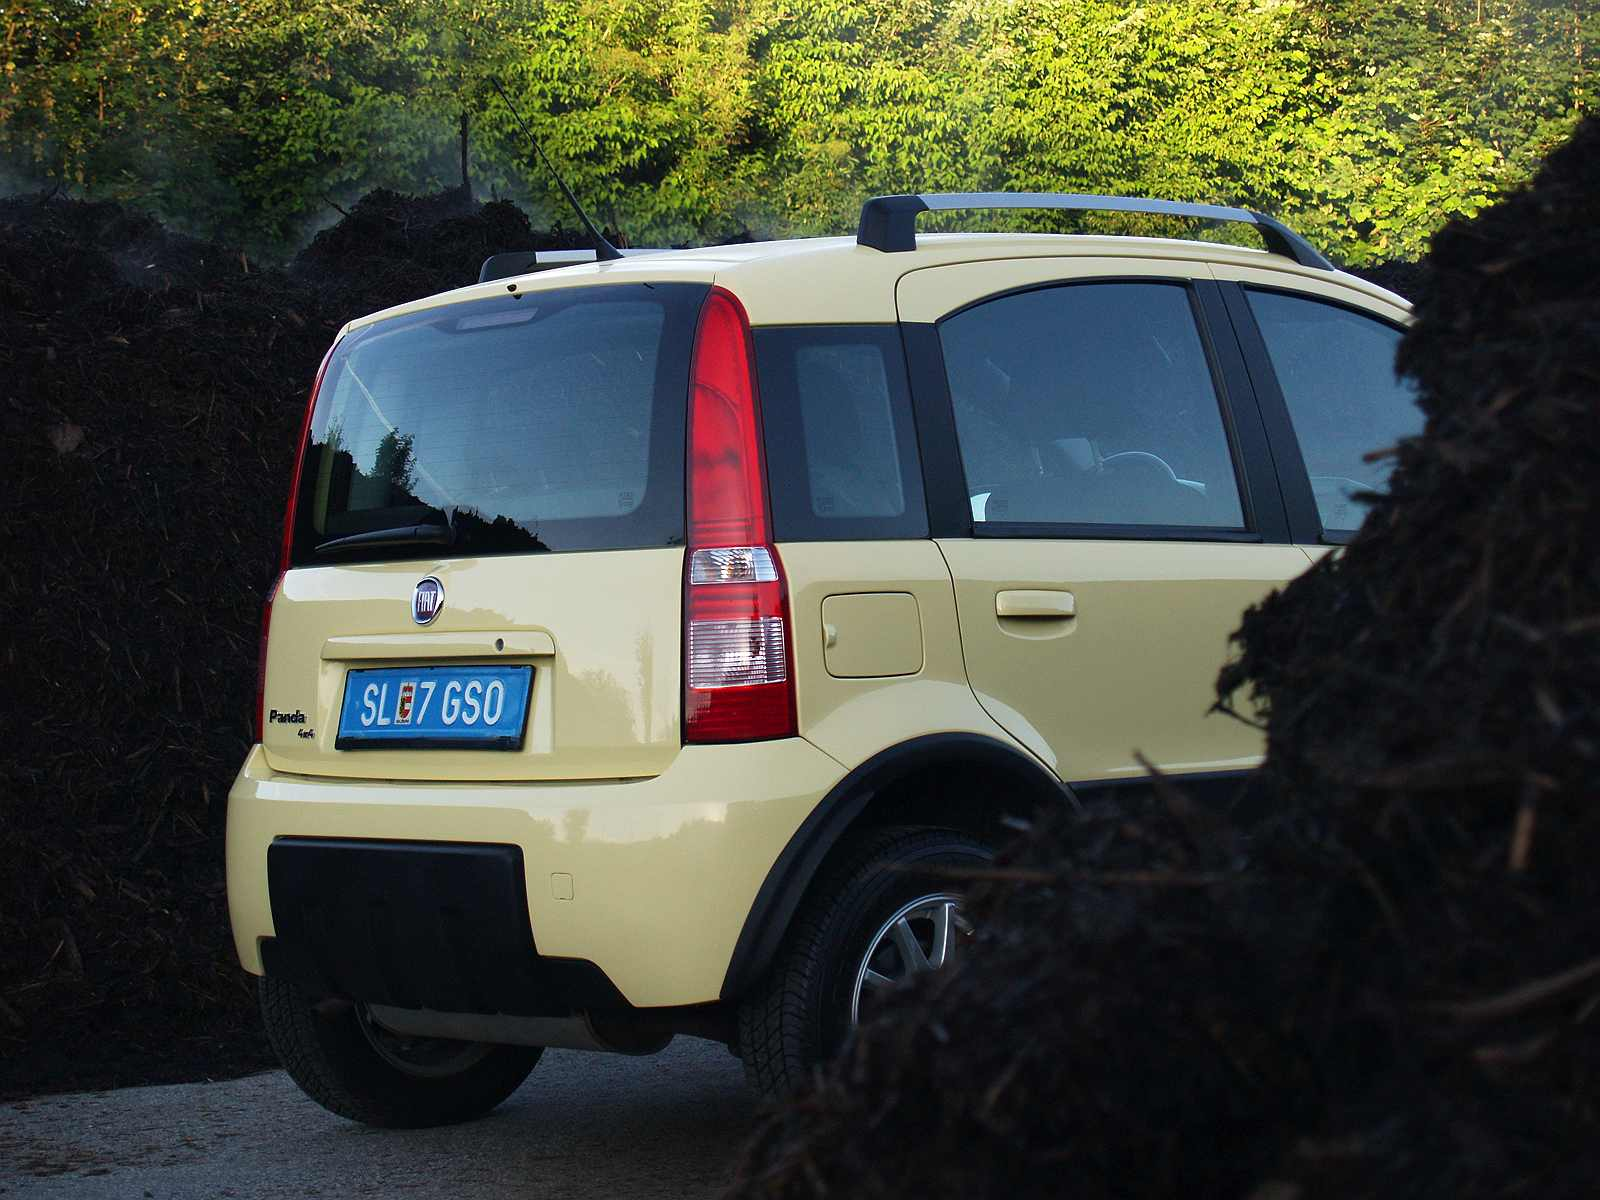 Prossinger Werbeagentur fotografiert: Fotostrecke Fiat Panda 169 Allrad